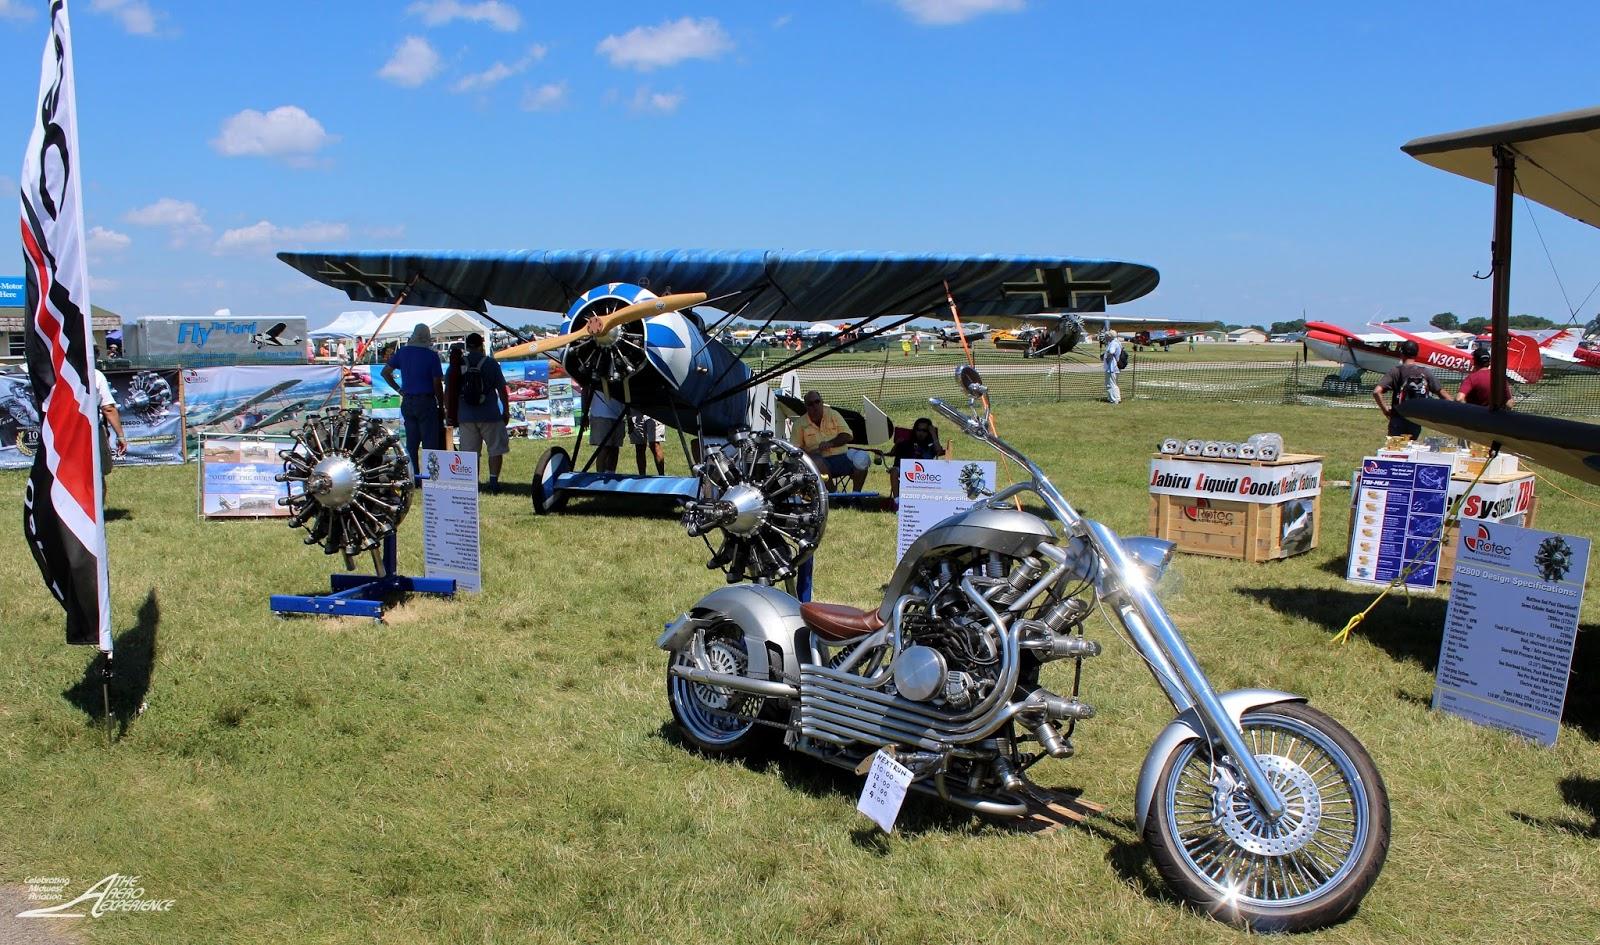 The Aero Experience: EAA AirVenture Oshkosh 2016: Exhibitors